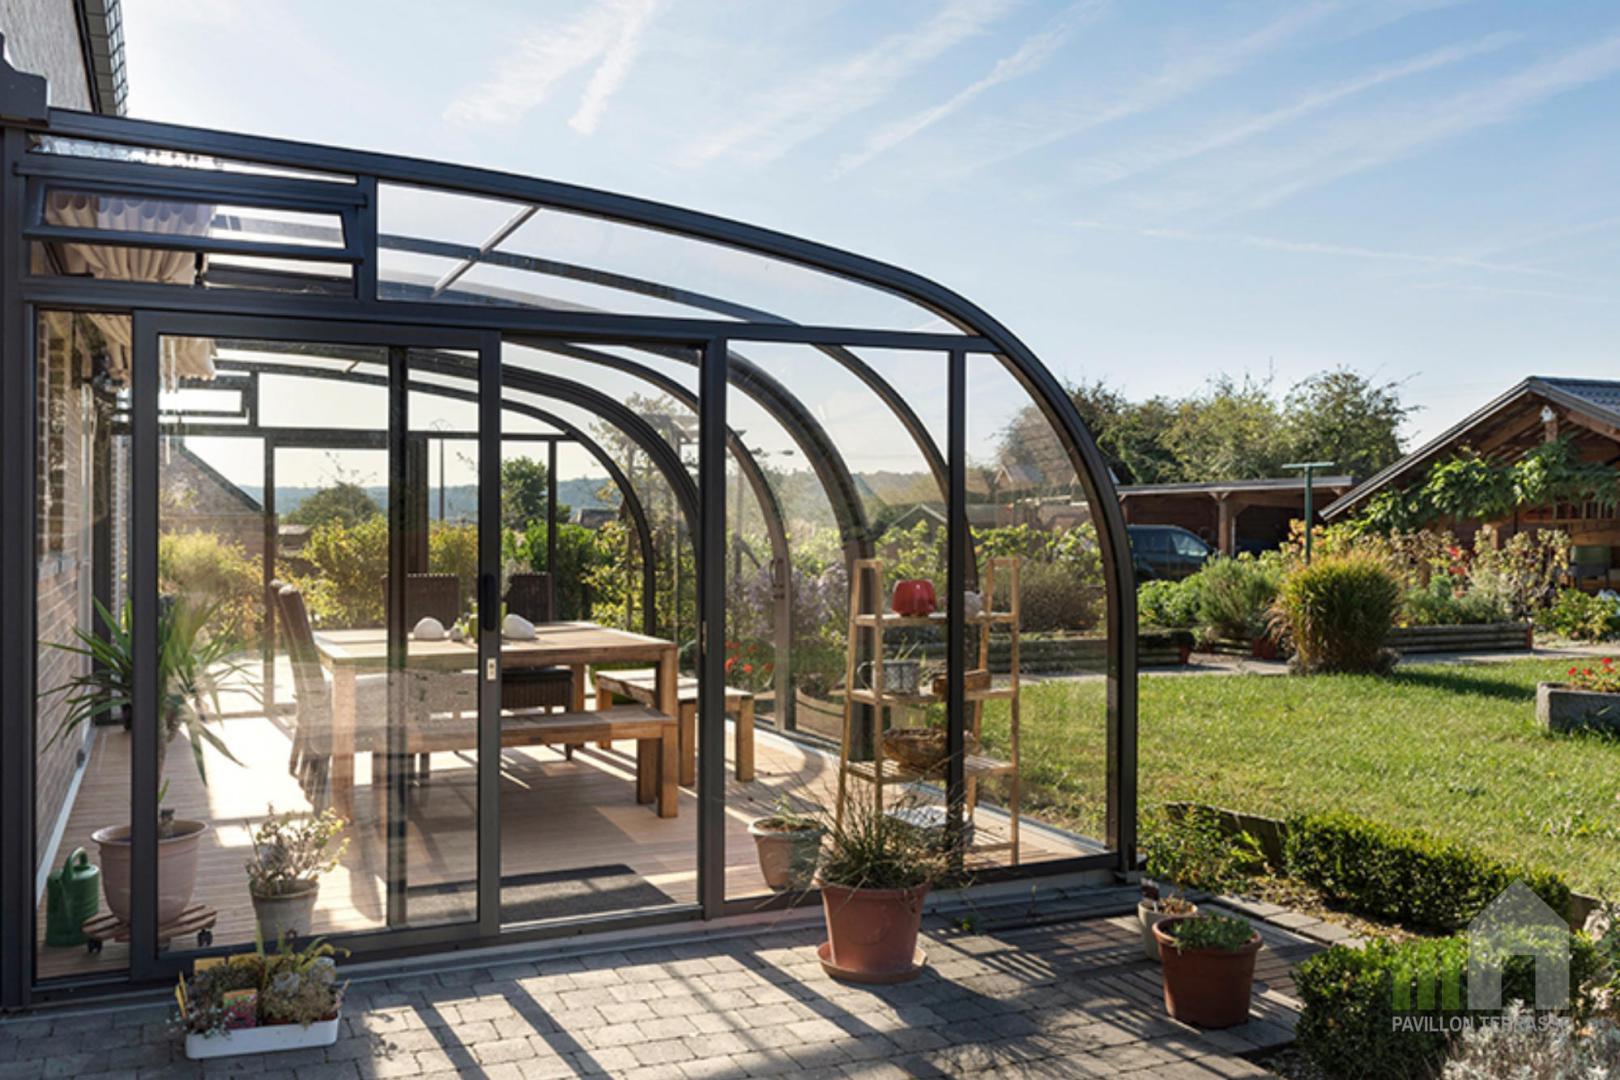 Www Abri Terrasse Com terrace covers i solar veranda aluminium voroka retractable